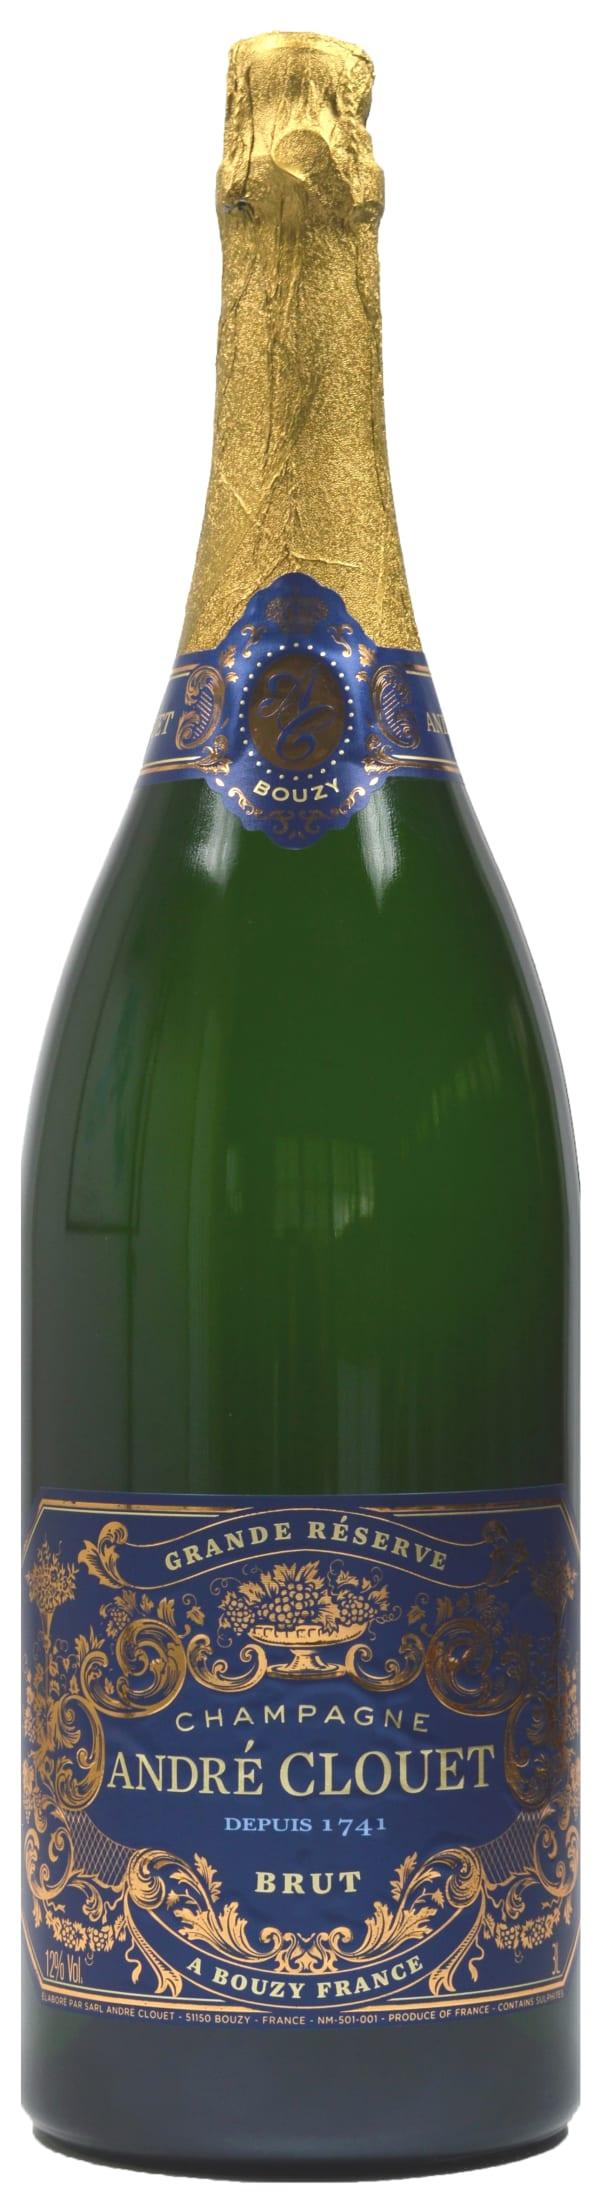 André Clouet Grande Reserve Champagne Brut Jeroboam